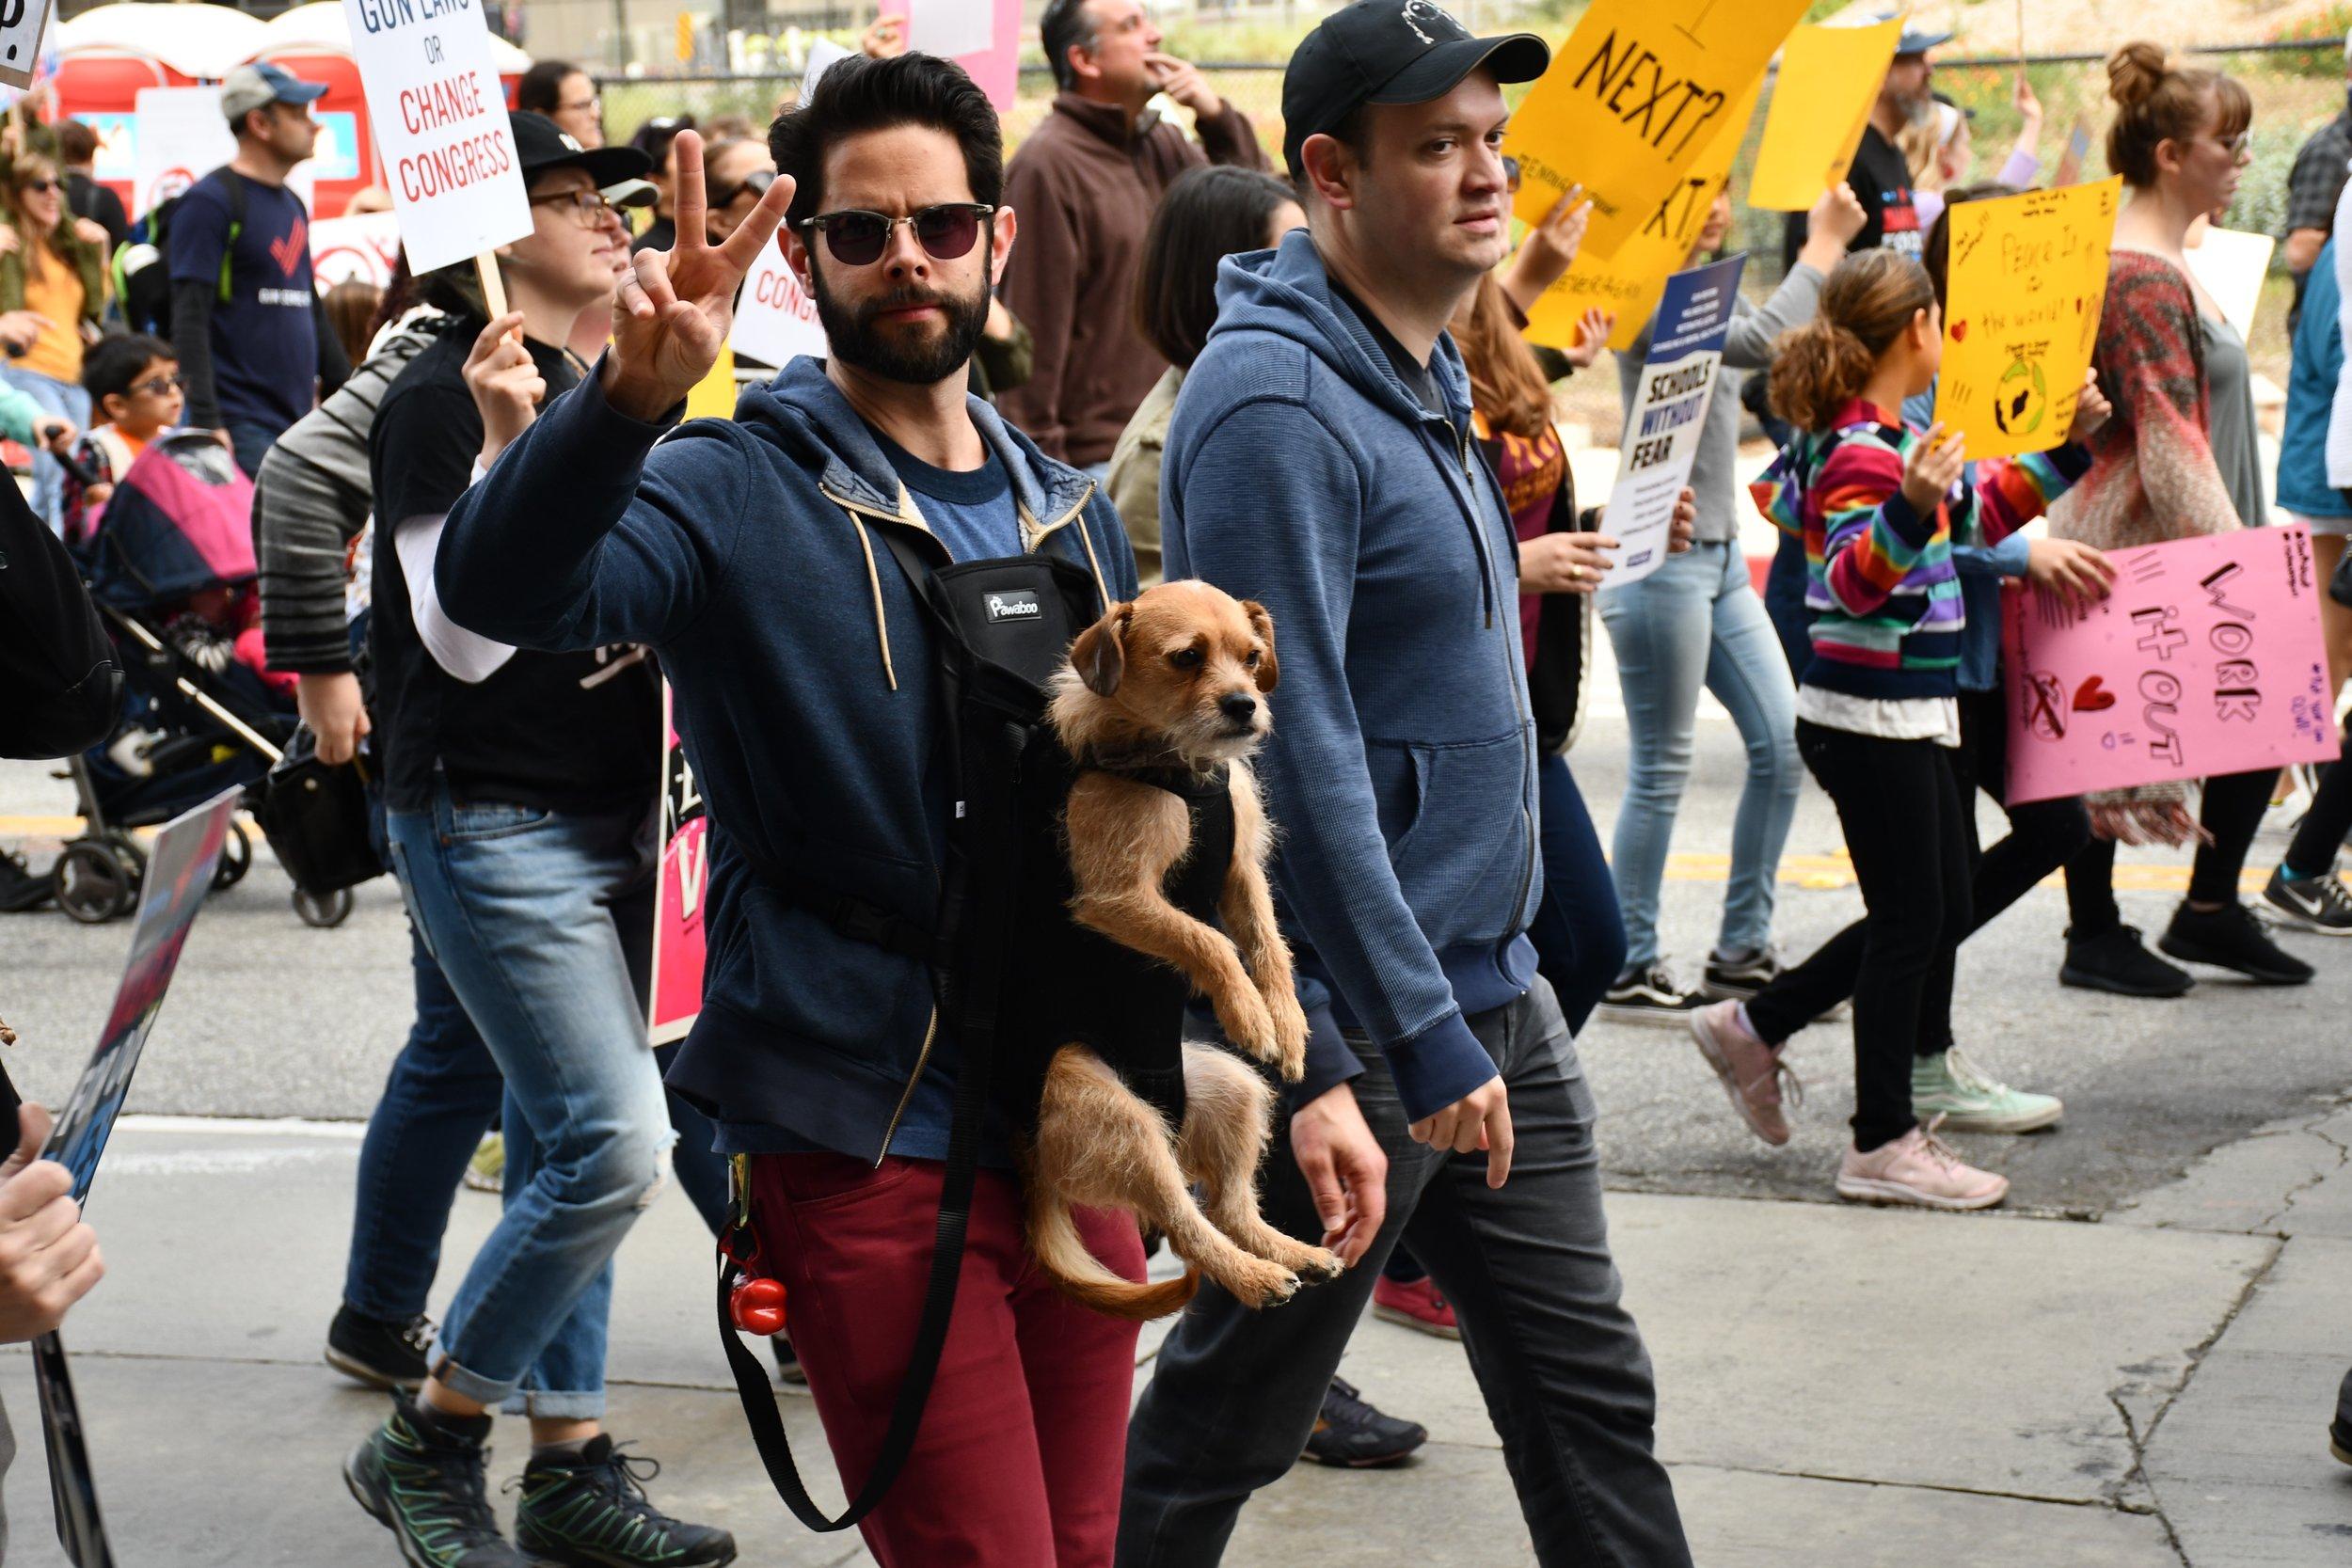 march for our lives LA, 2018